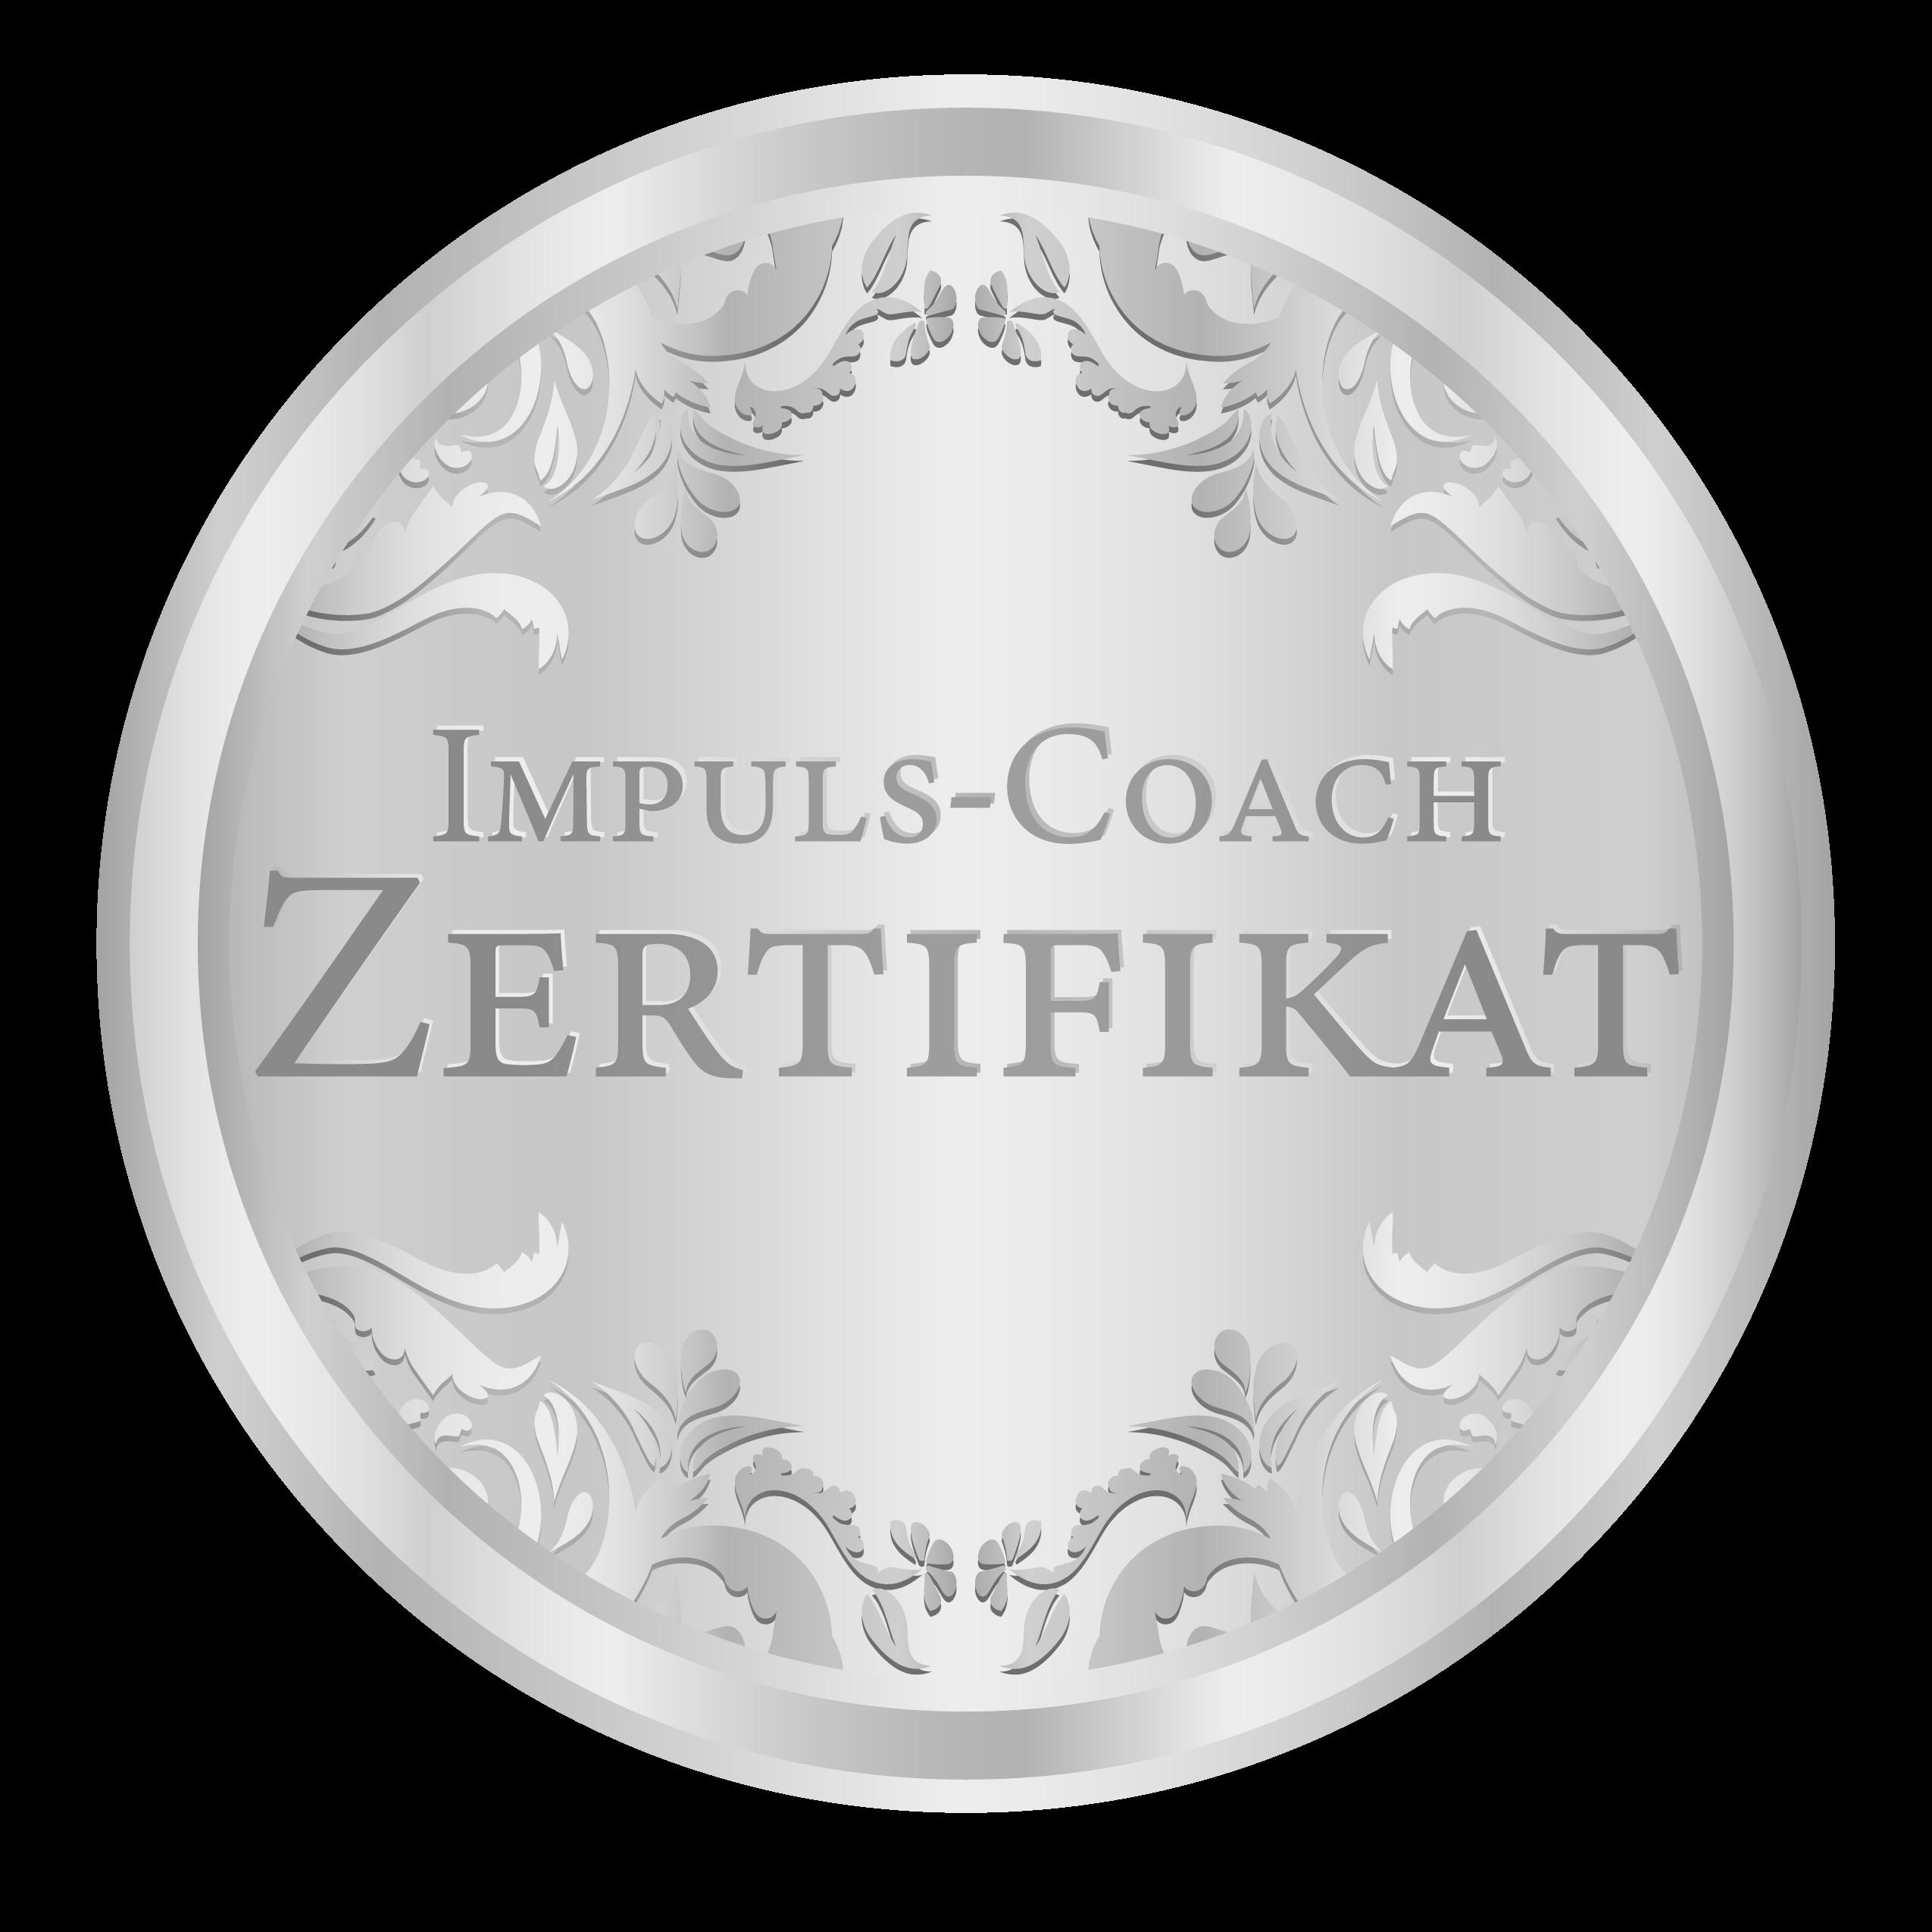 Impuls-Coach-Zertifikat- Damian Richter